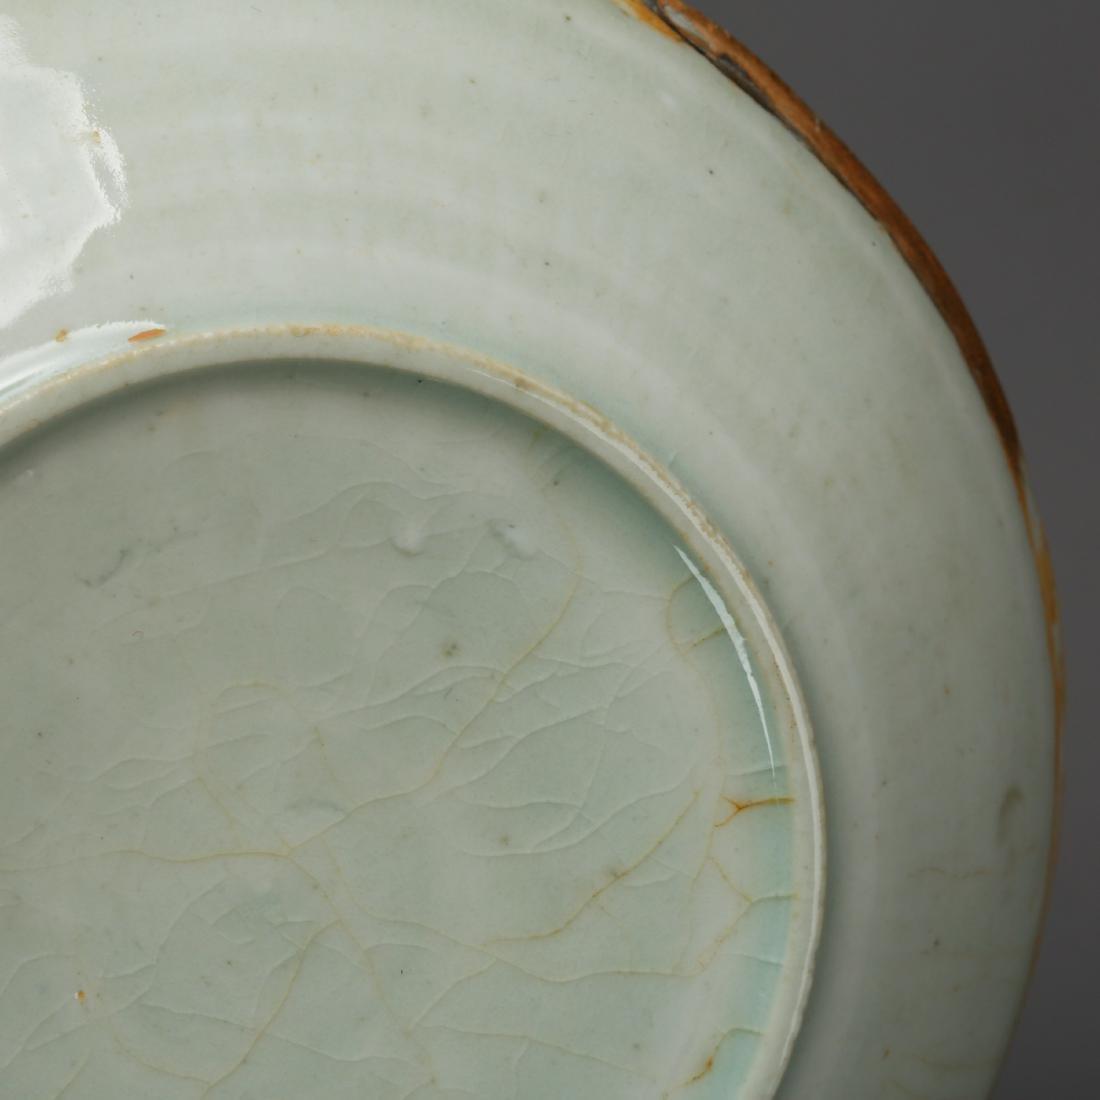 CHINESE CELADON GLAZED PLATE - 8